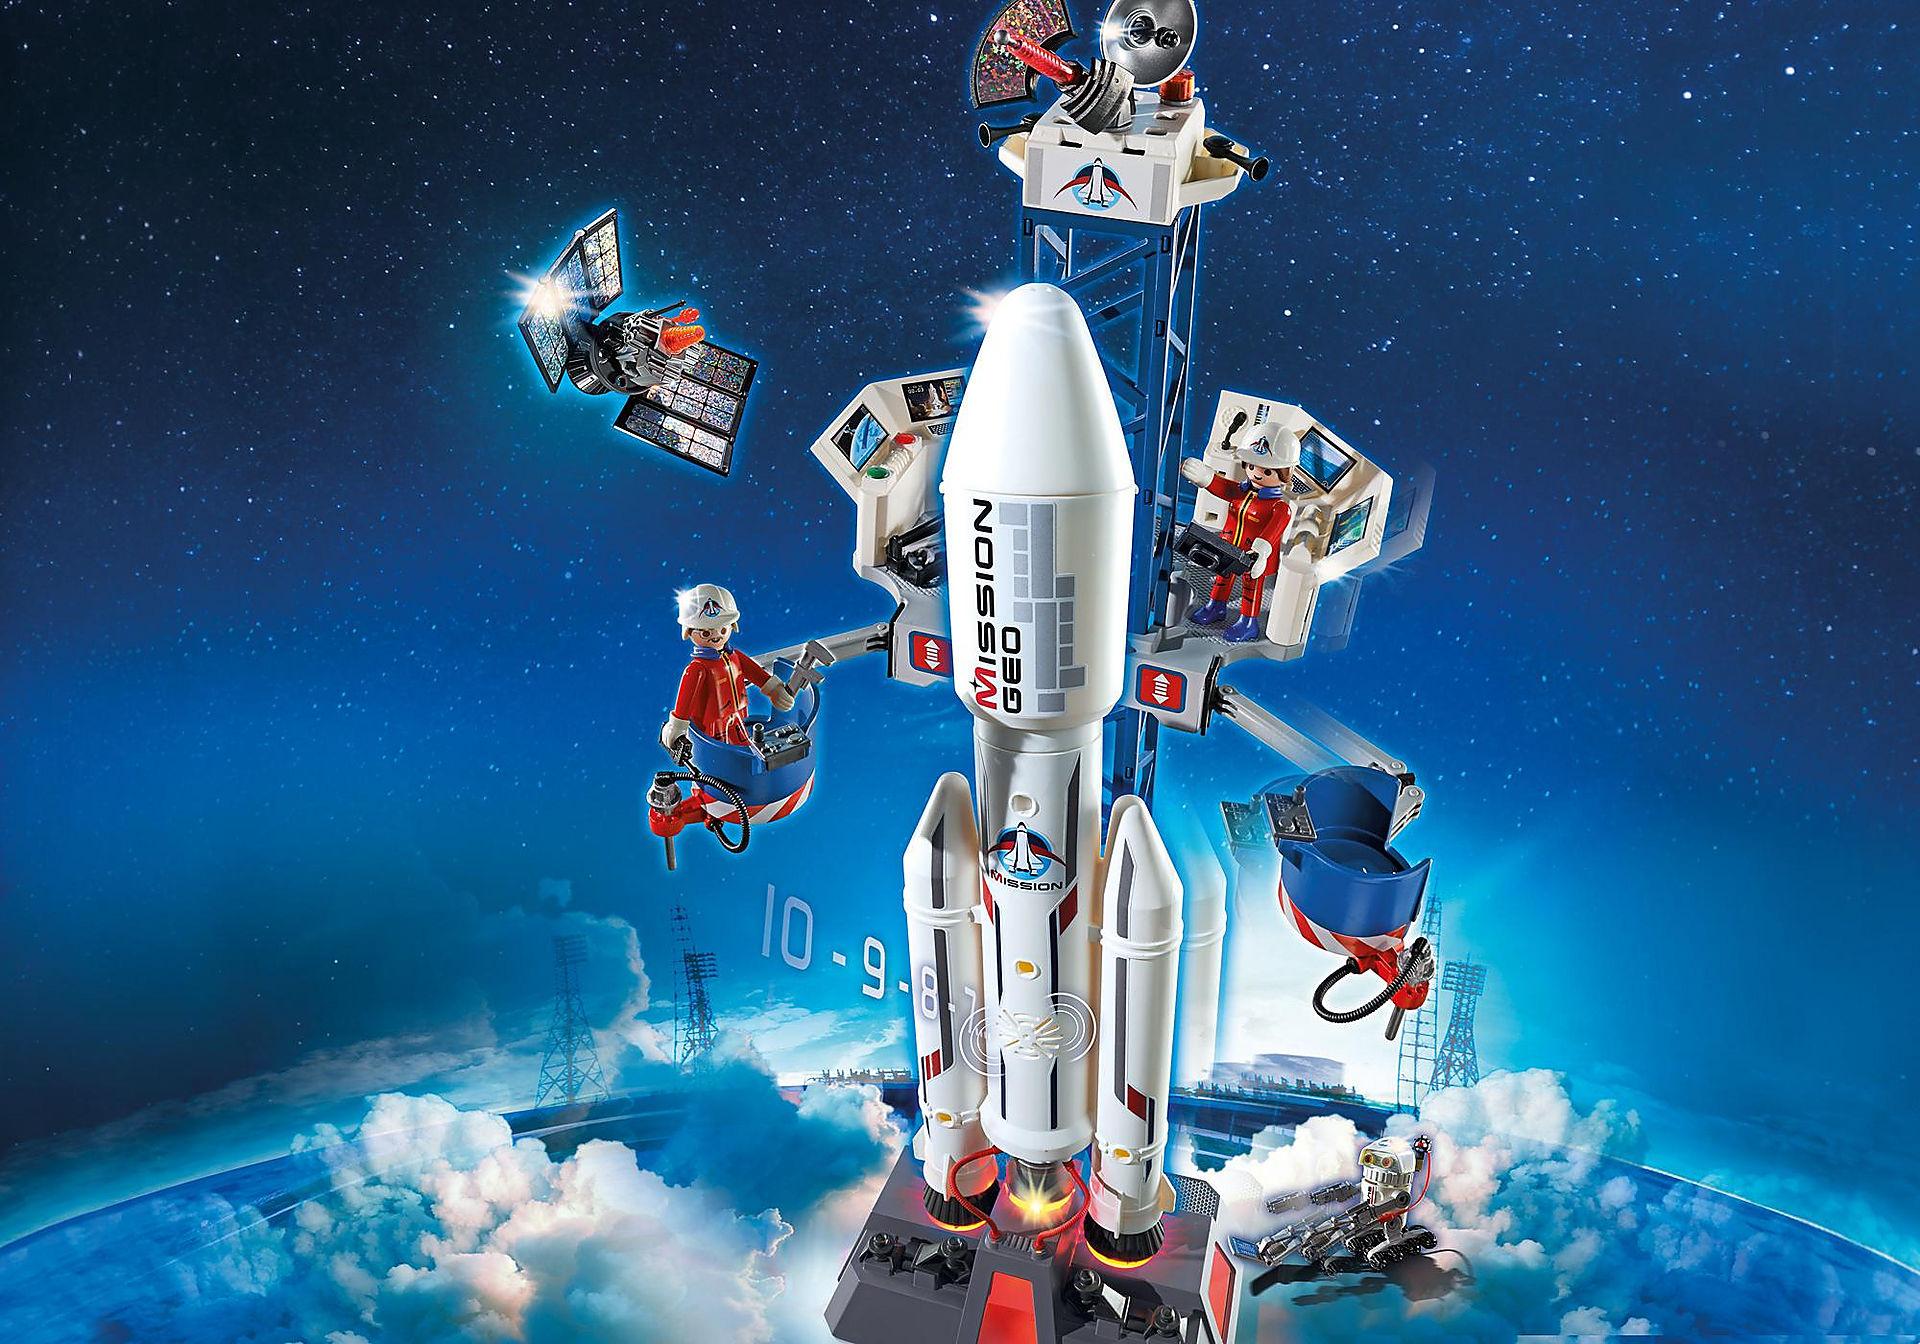 http://media.playmobil.com/i/playmobil/6195_product_detail/Cohete con Plataforma de Lanzamiento